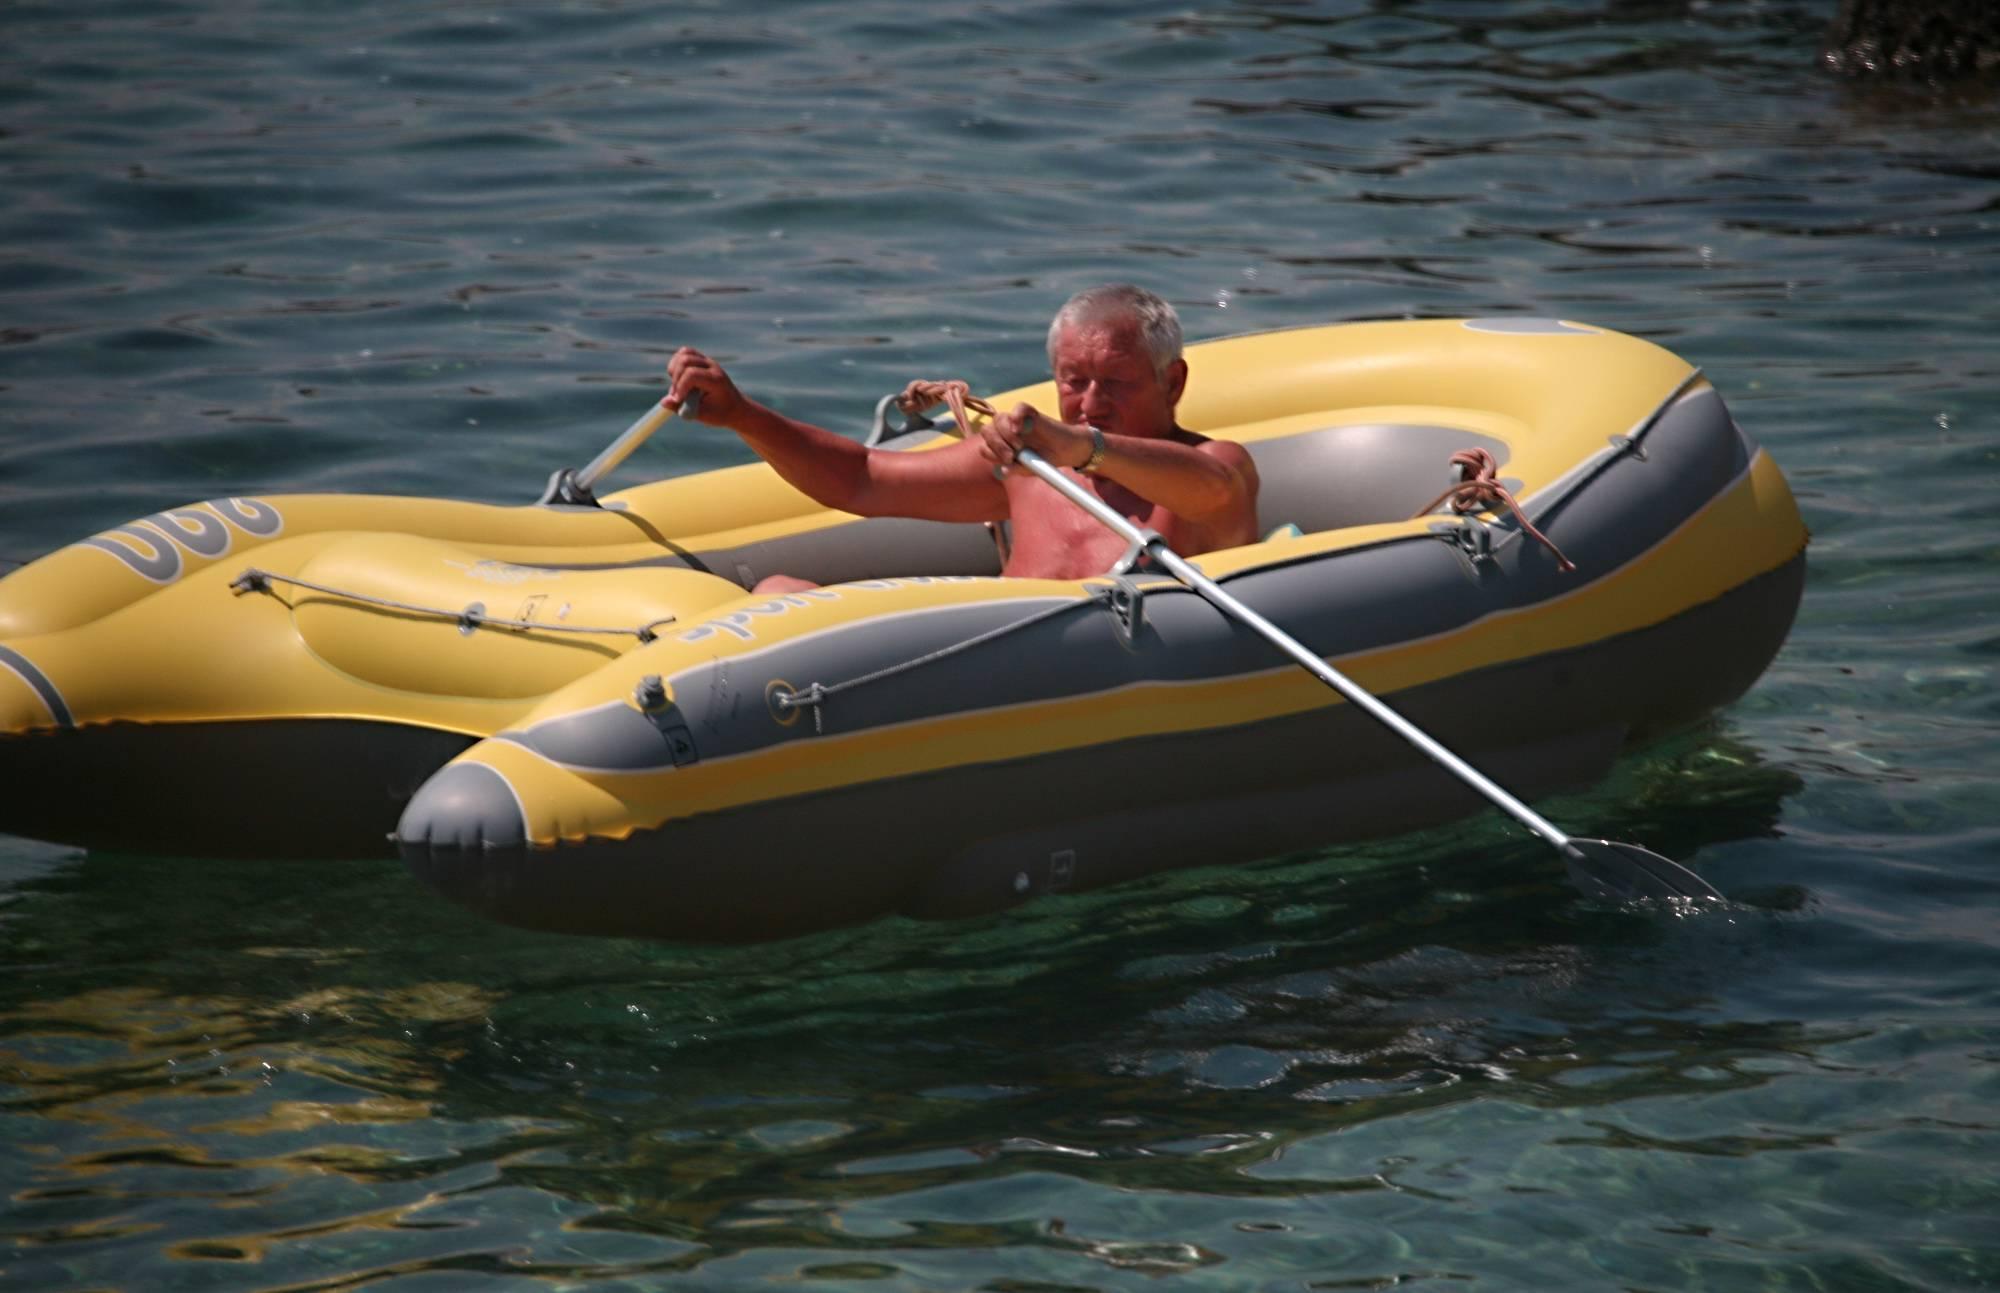 Lone Nudist in Yellow Boat - 2